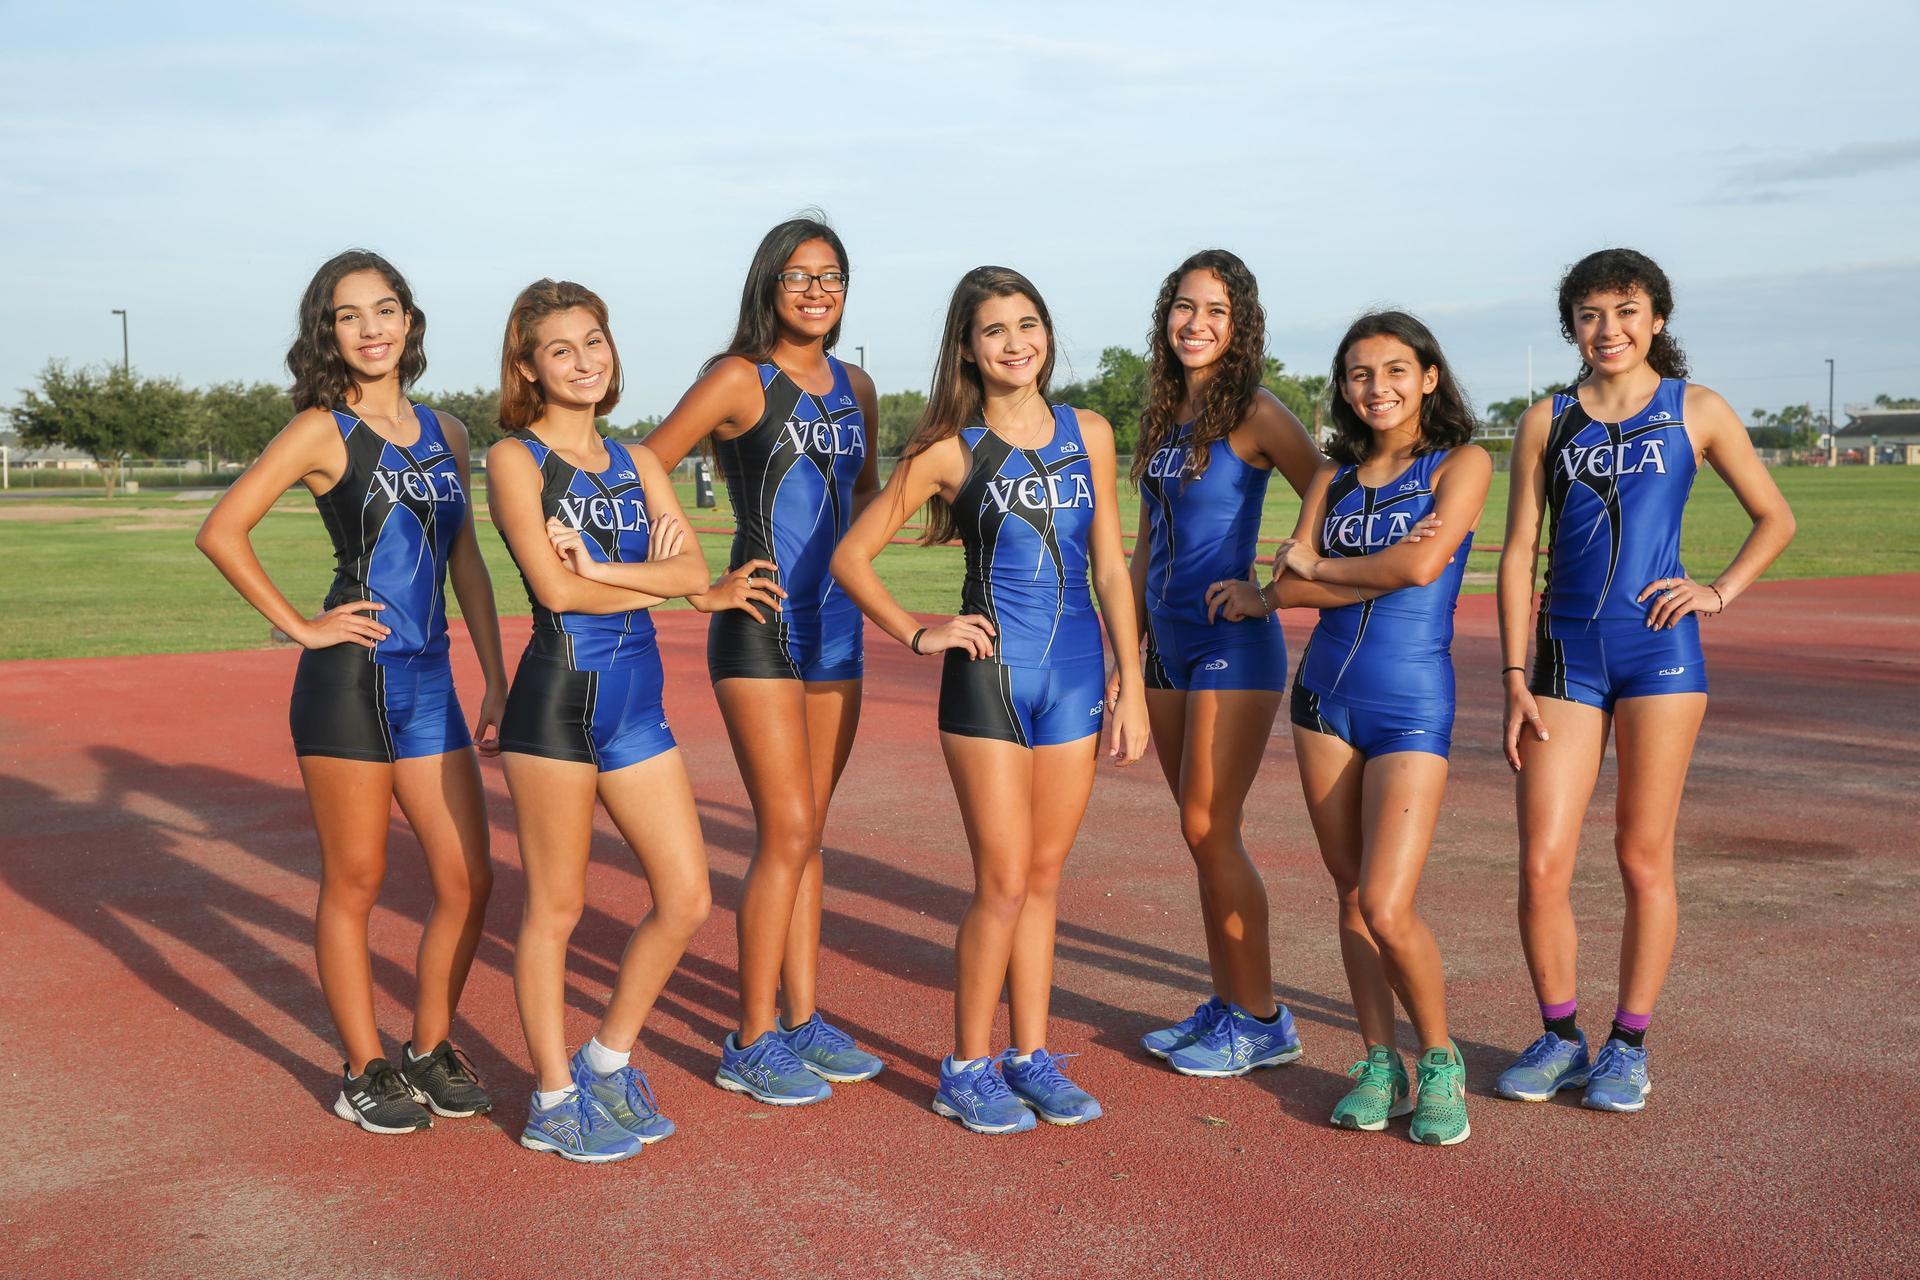 Image of: VARSITY TEAM: Iliana Garza, Jasmine Alcoser, Jennifer Ruiz, Denise Ramos, Renae Diaz, Alyssa Galvan, Liliana Perez